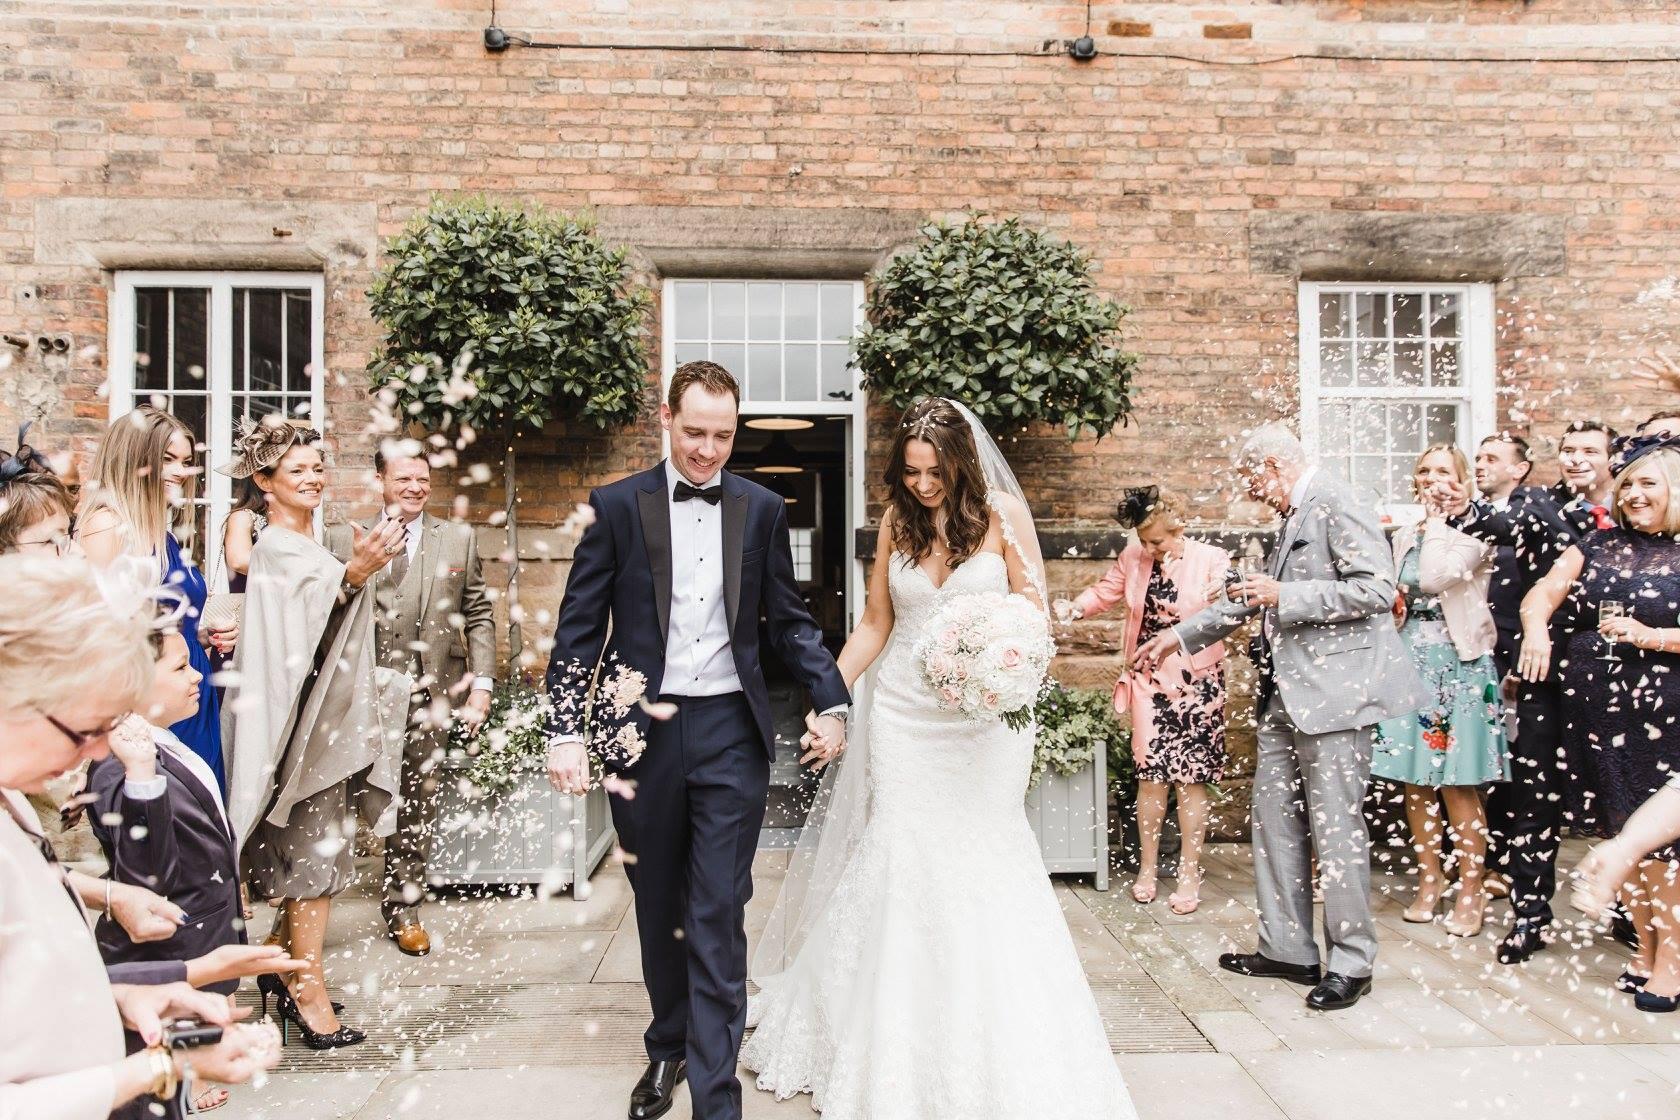 Weddit films - affordable wedding video